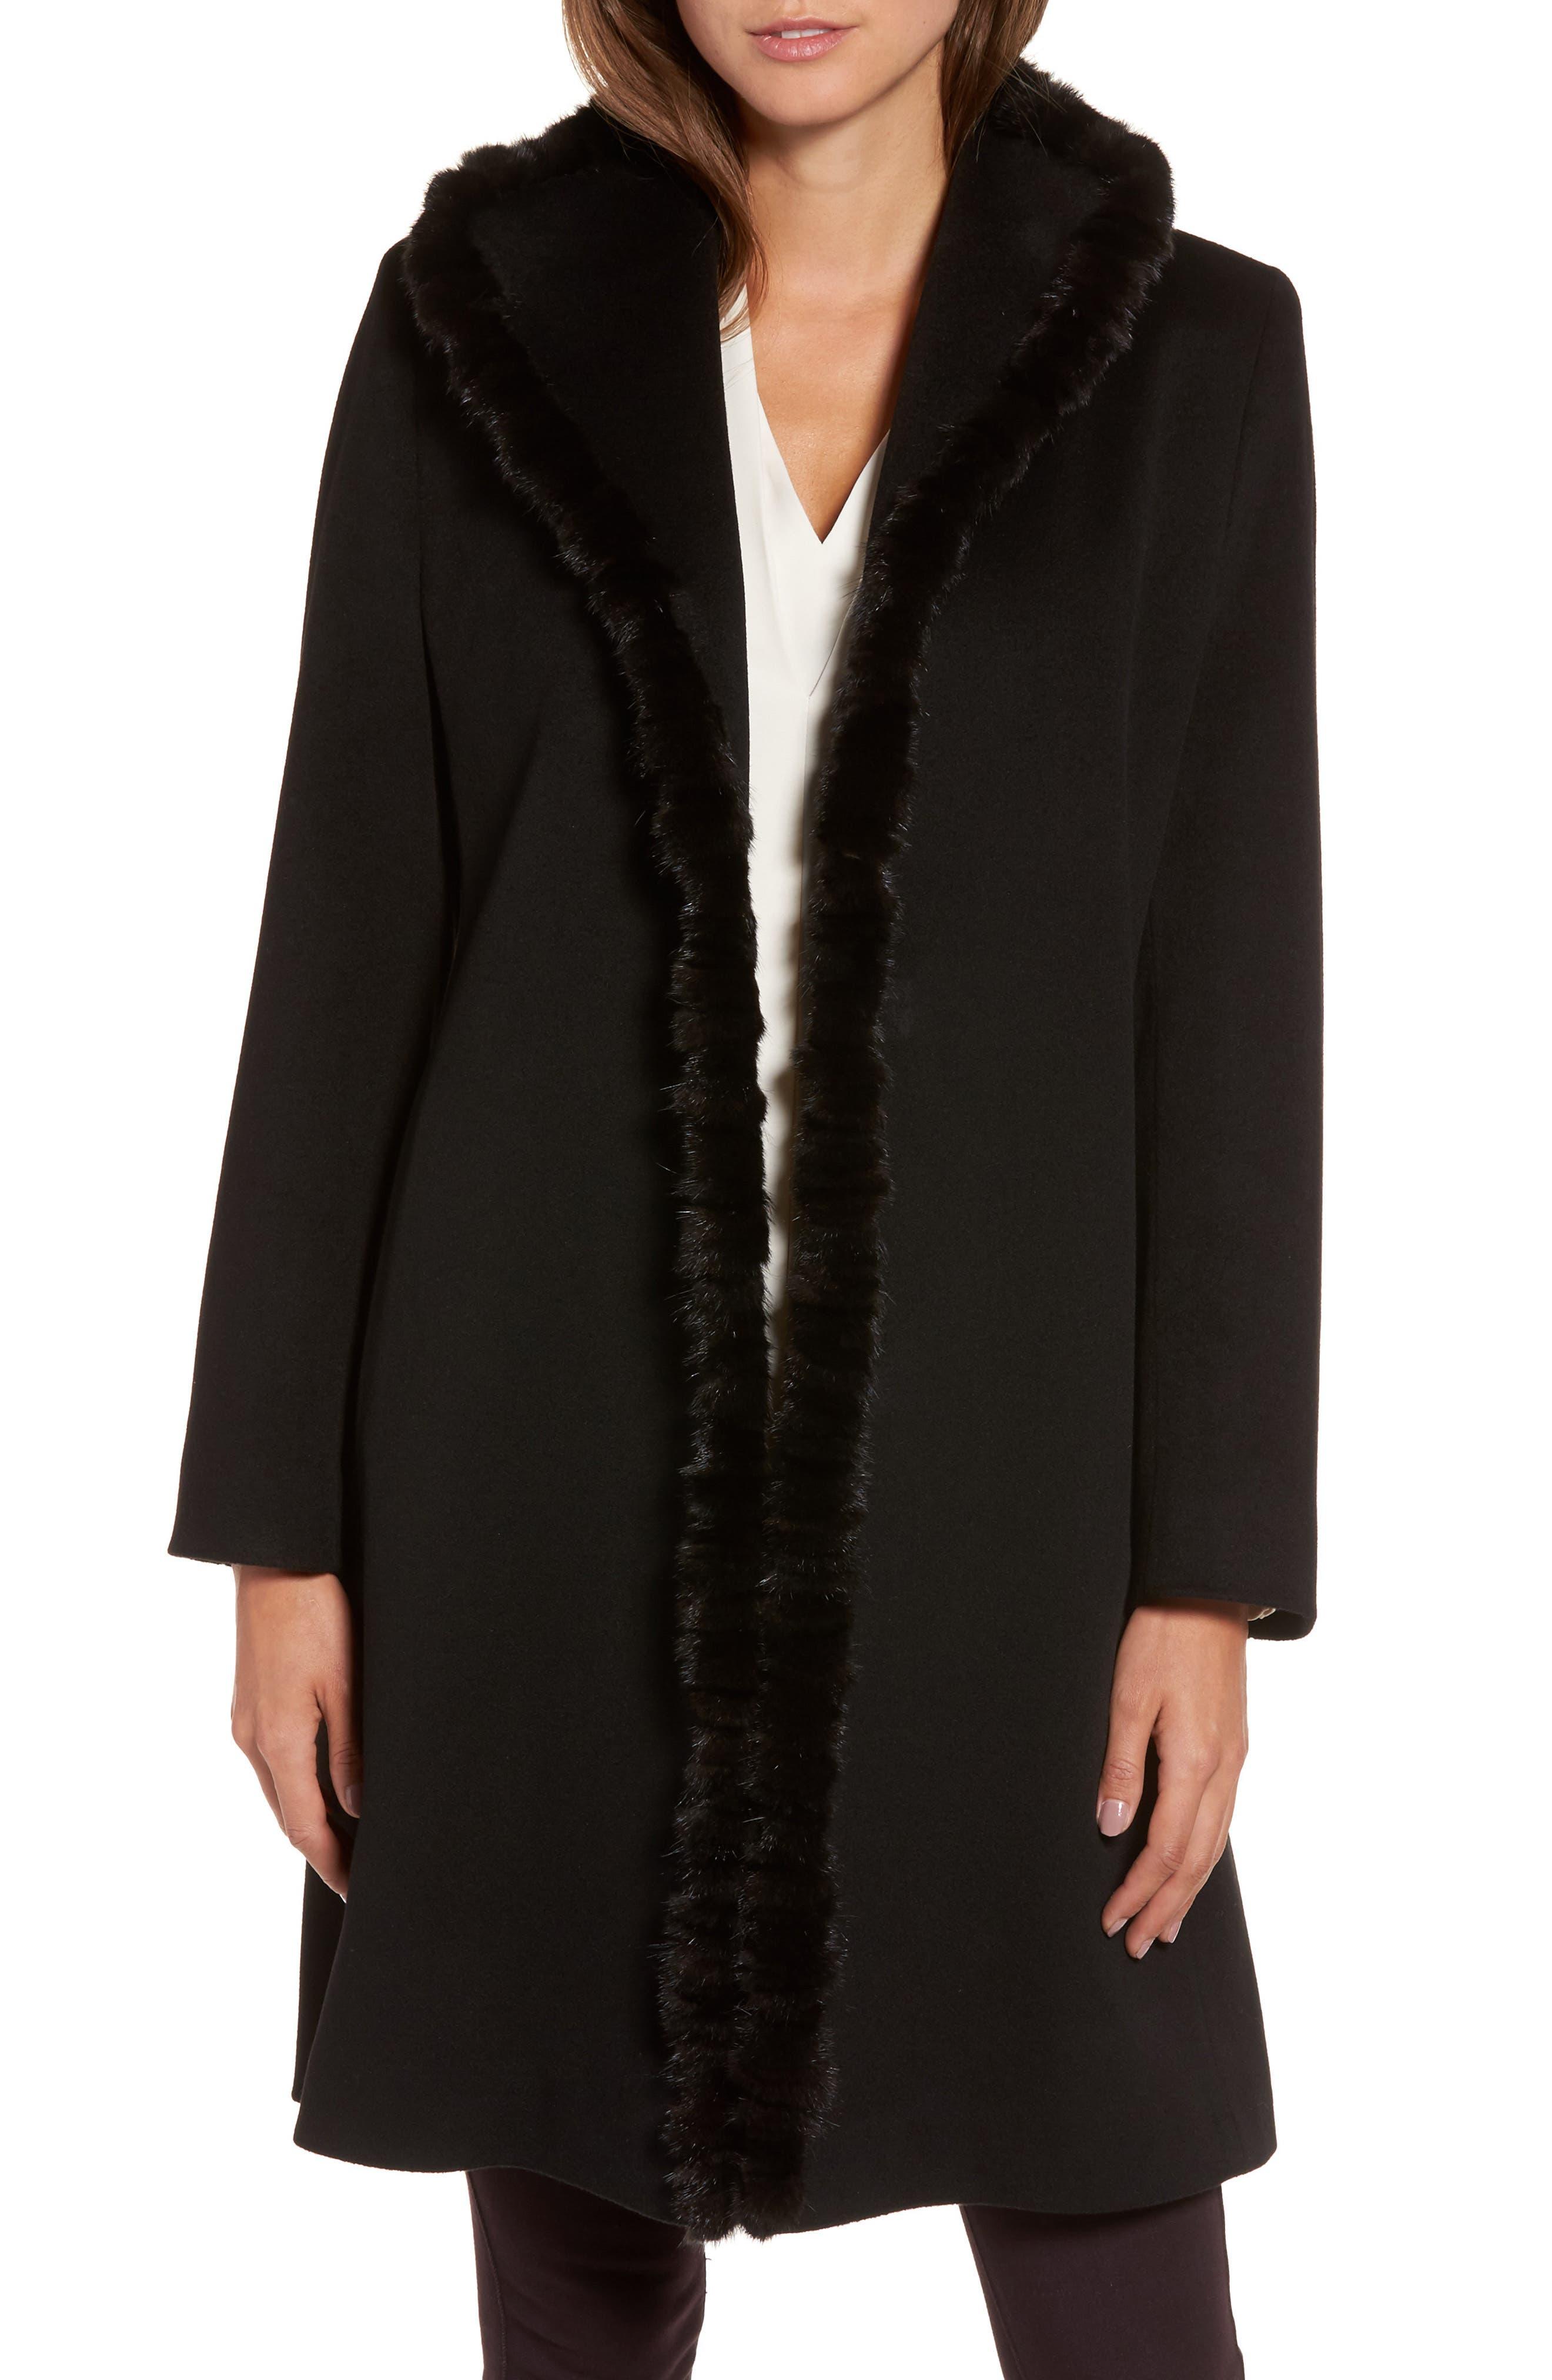 Main Image - Fleurette Loro Piana Wool Wing Collar Coat with Genuine Mink Trim